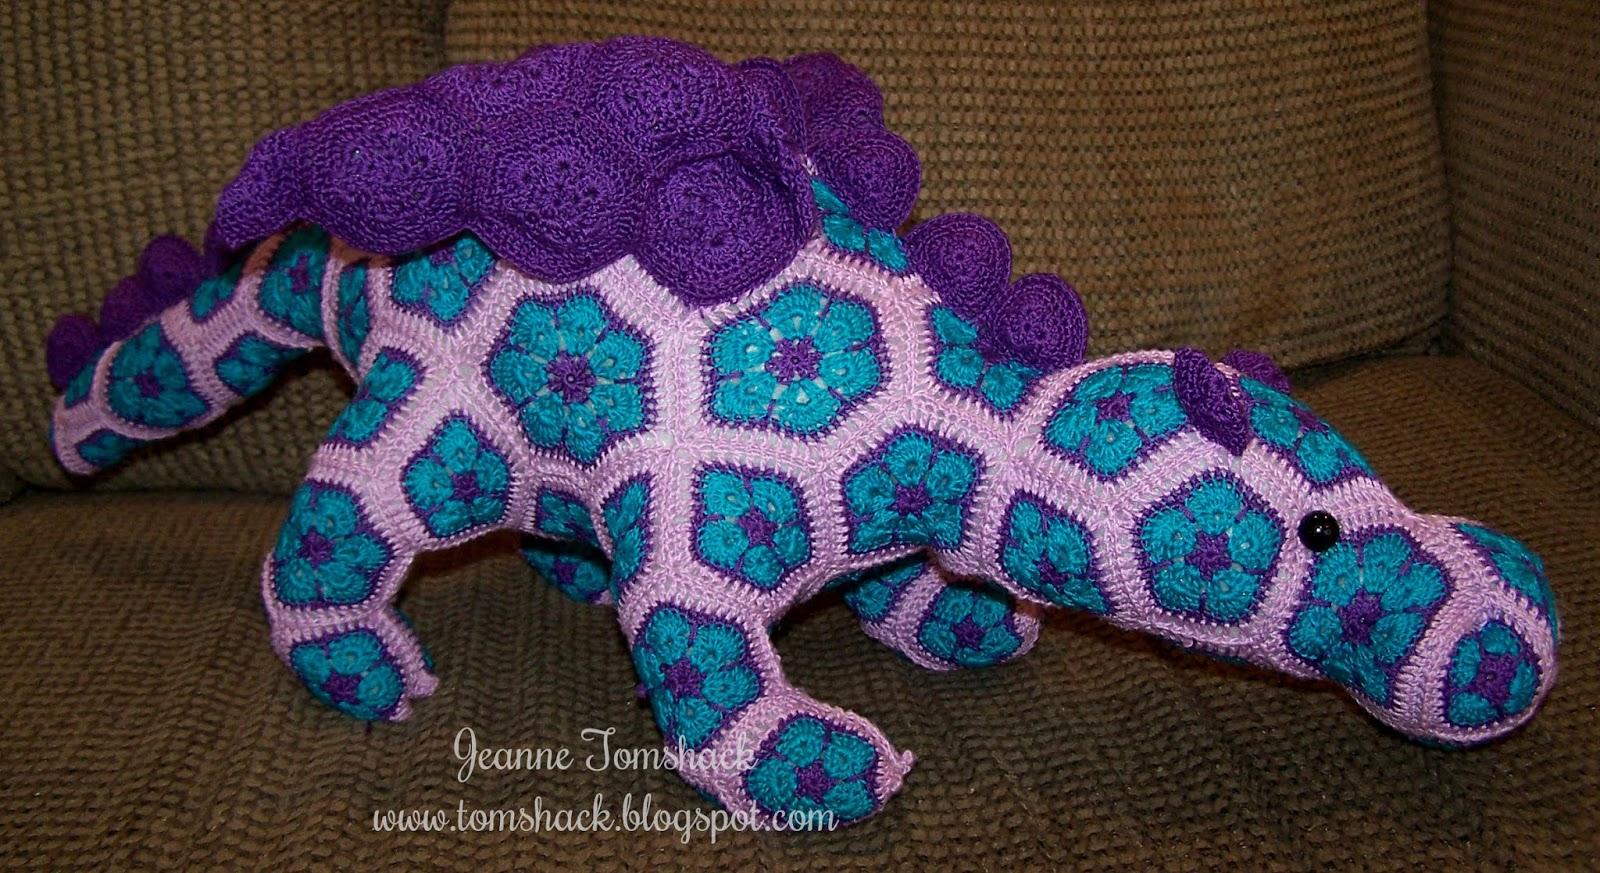 African Flower Crochet Dragon Pattern : Creative Bliss: Crochet African Flower Motif Dragon called ...